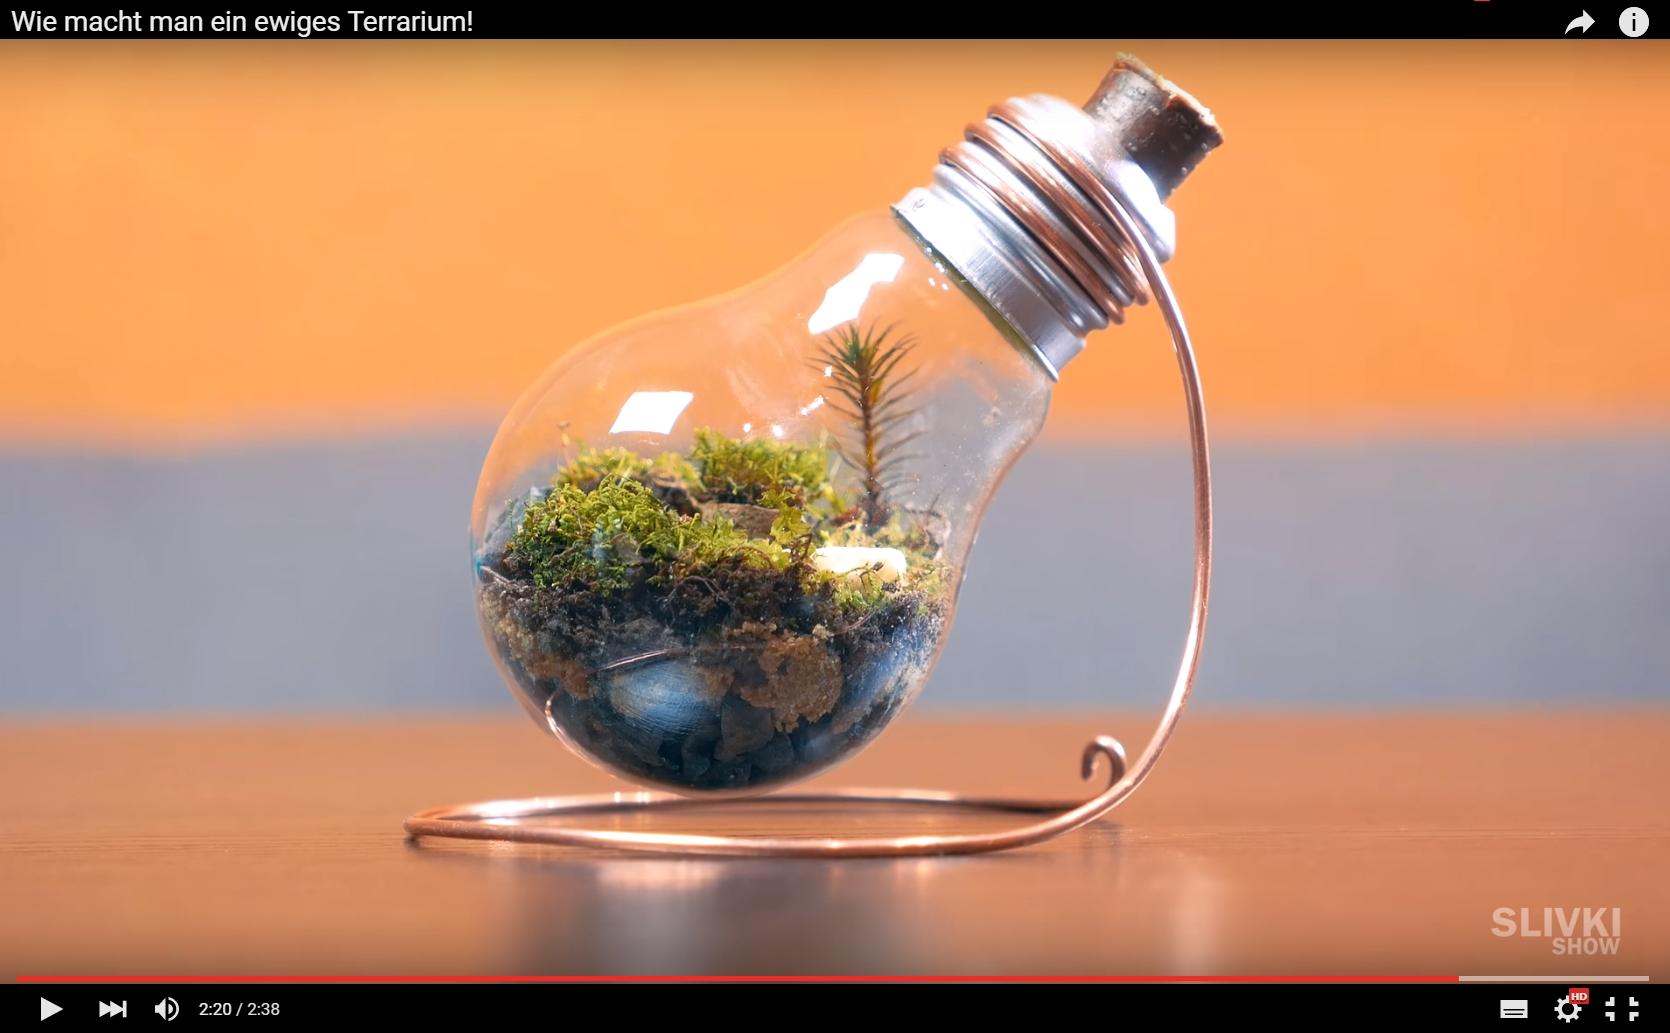 Terrarium Aus Einer Gluhbirne Okosystem Kreativ Blog Diy Gadgets